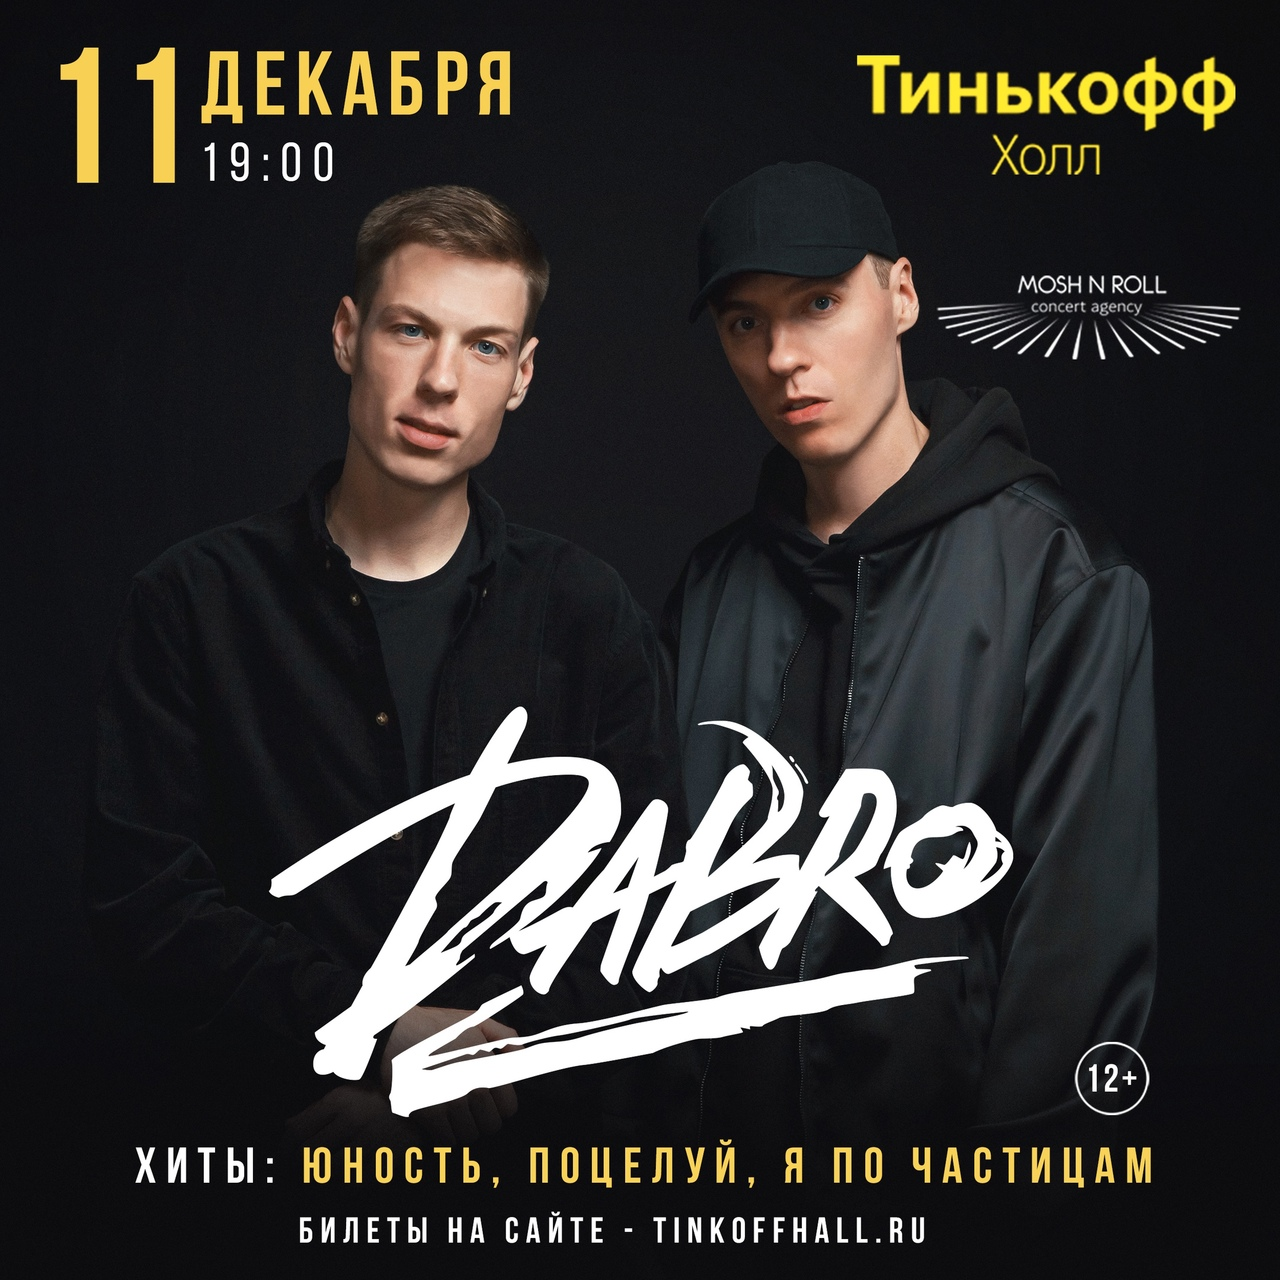 Афиша Уфа DABRO / 11 ДЕКАБРЯ / ТИНЬКОФФ ХОЛЛ / УФА